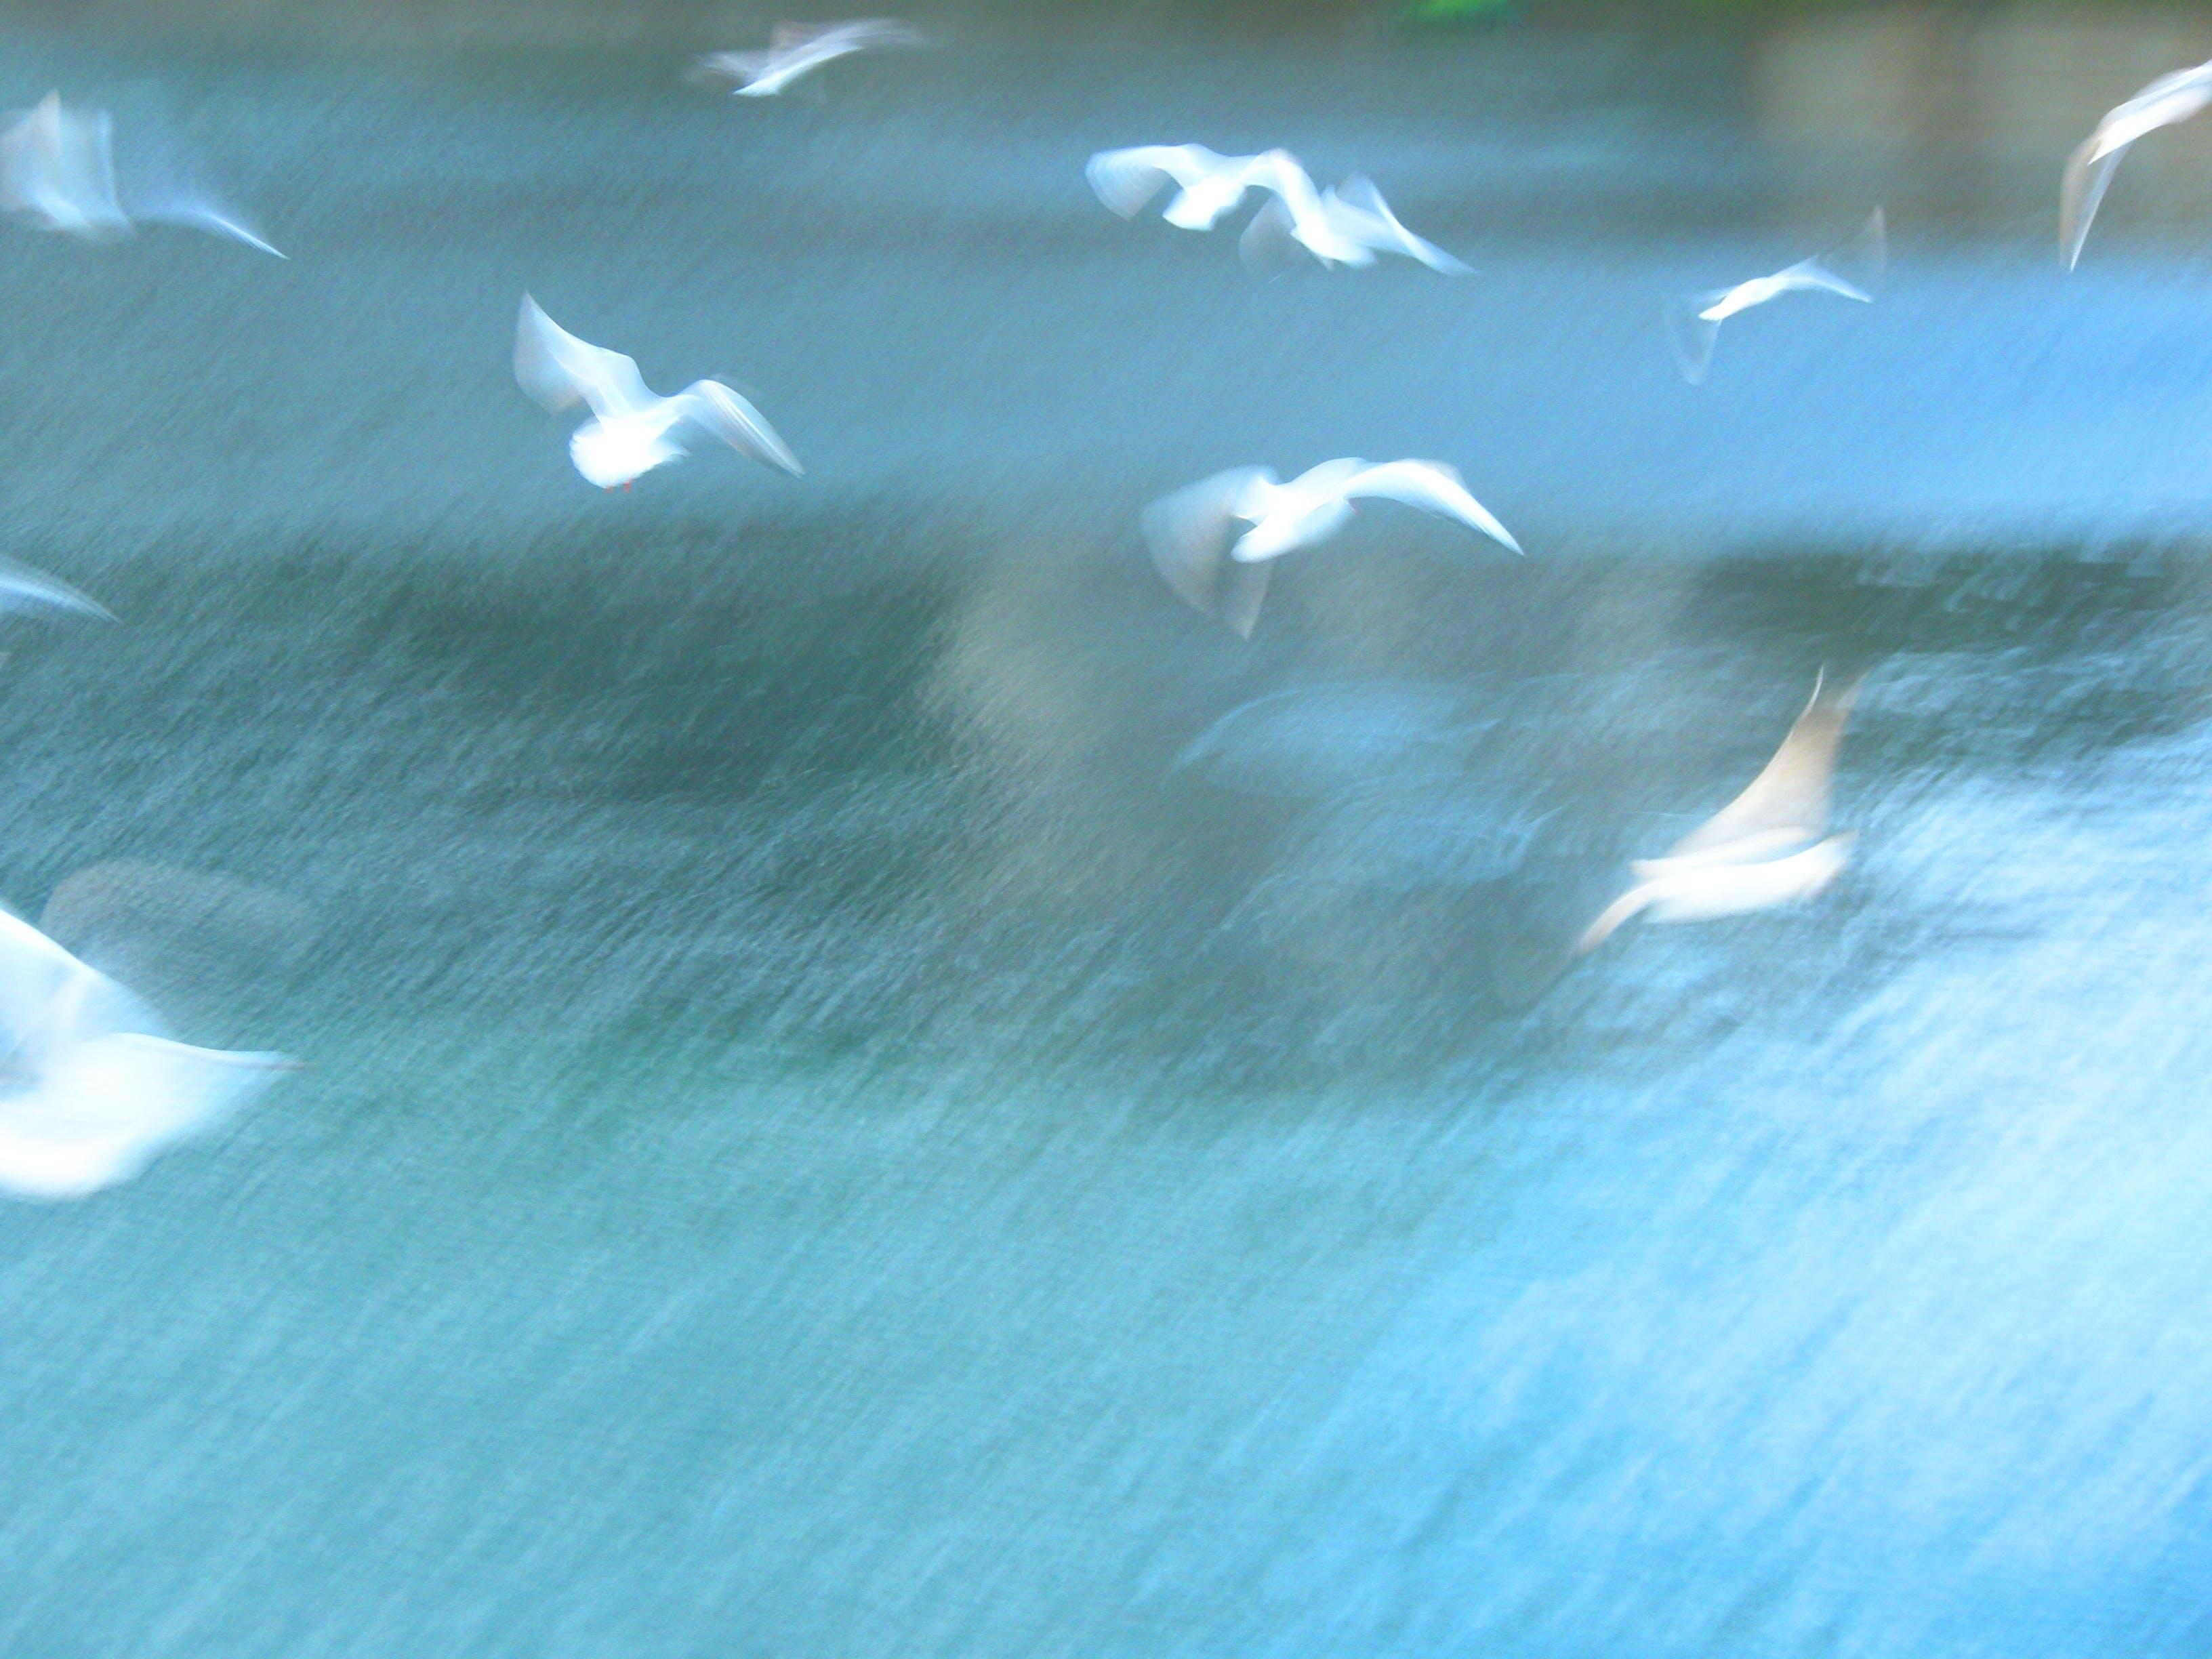 Free stock photo of sea, seagull, seagulls, seaside